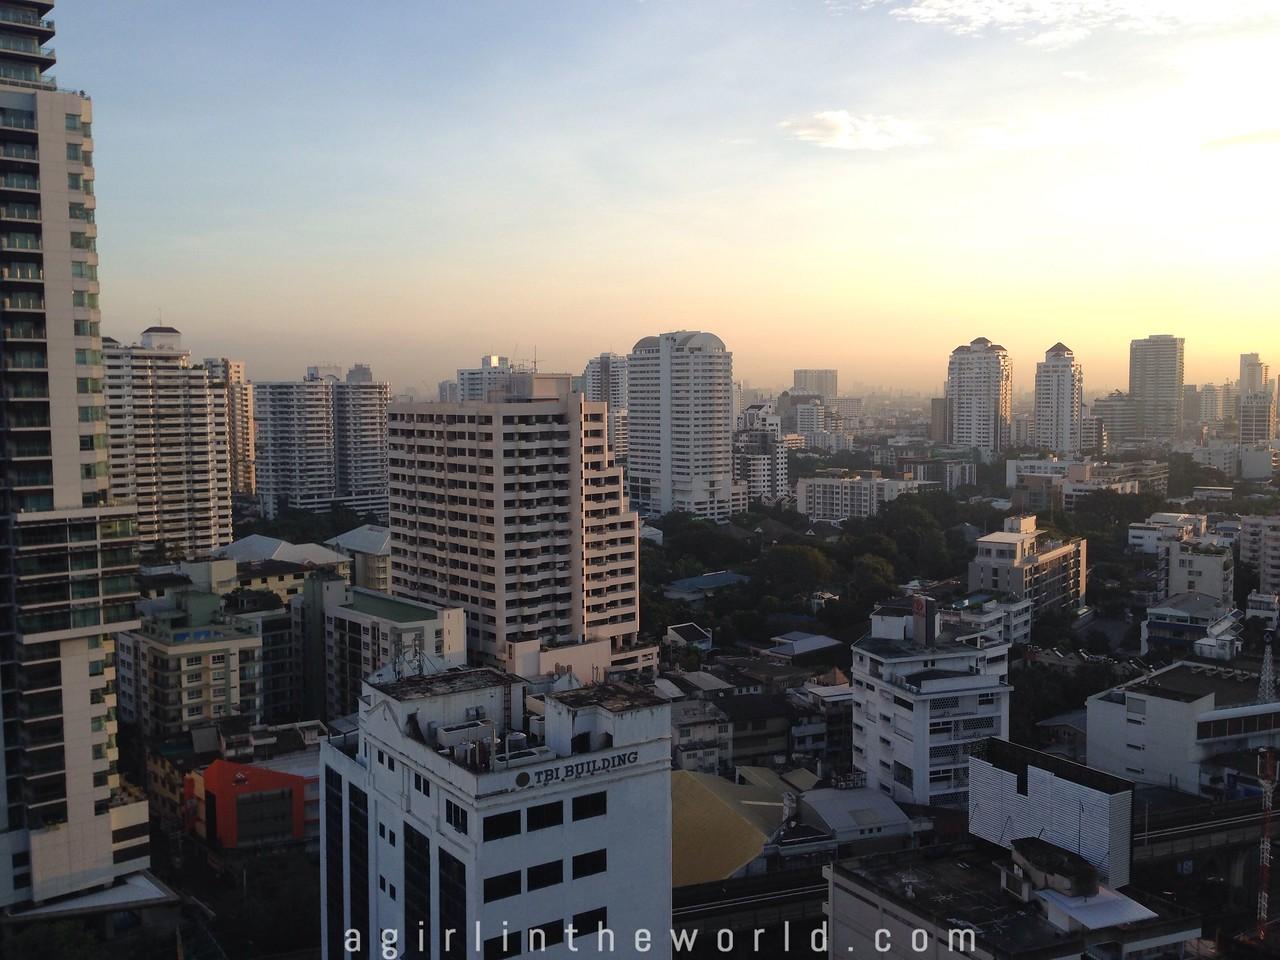 Denise Gamboa www.agirlintheworld.com Bangkok Thailanf